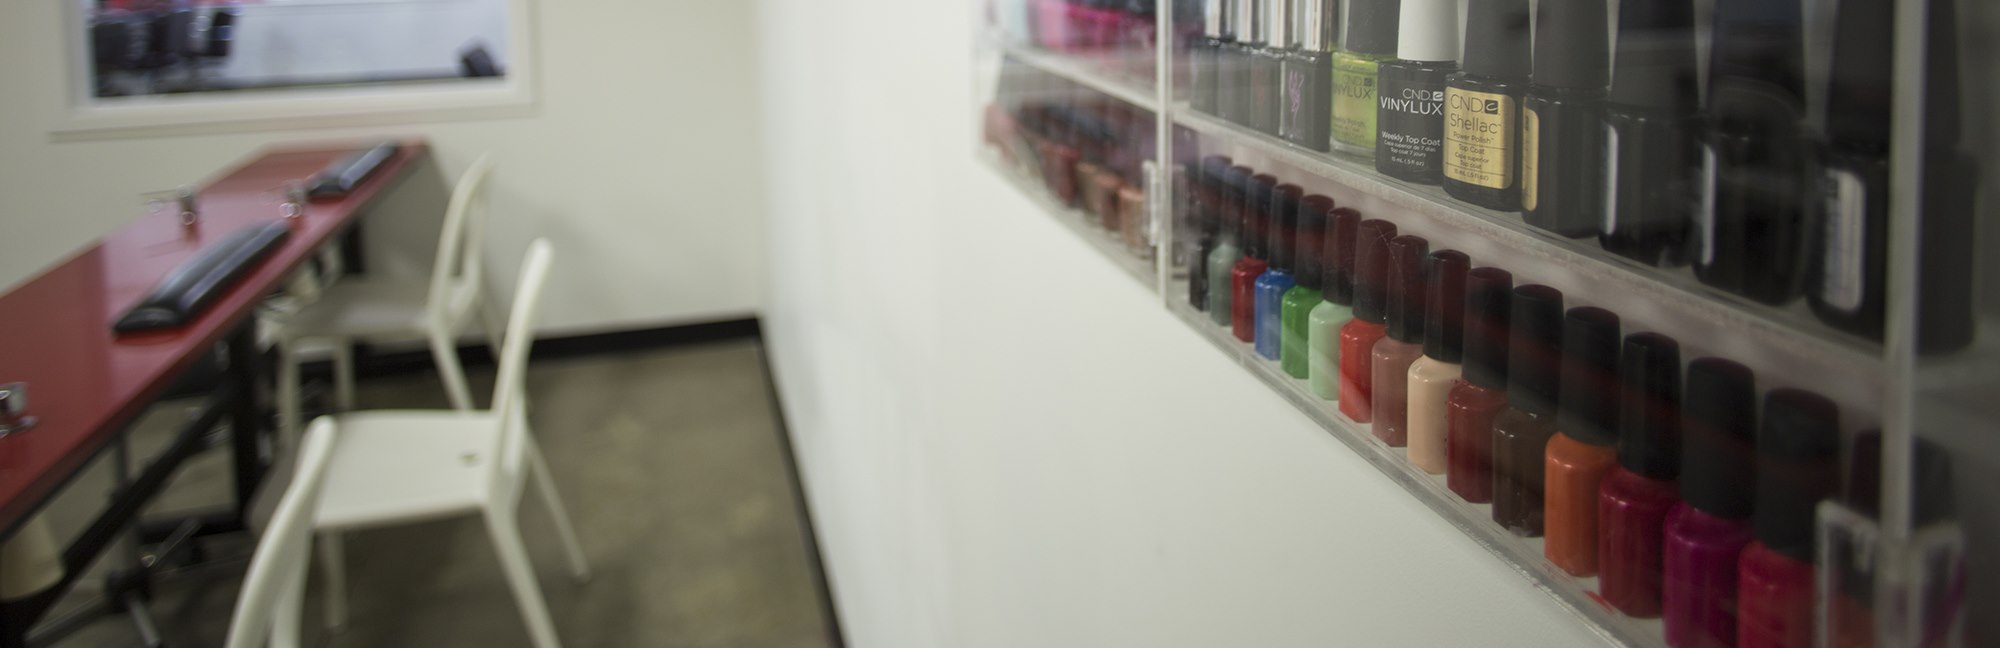 Schilling Douglas Newark Delaware Cosmetology School